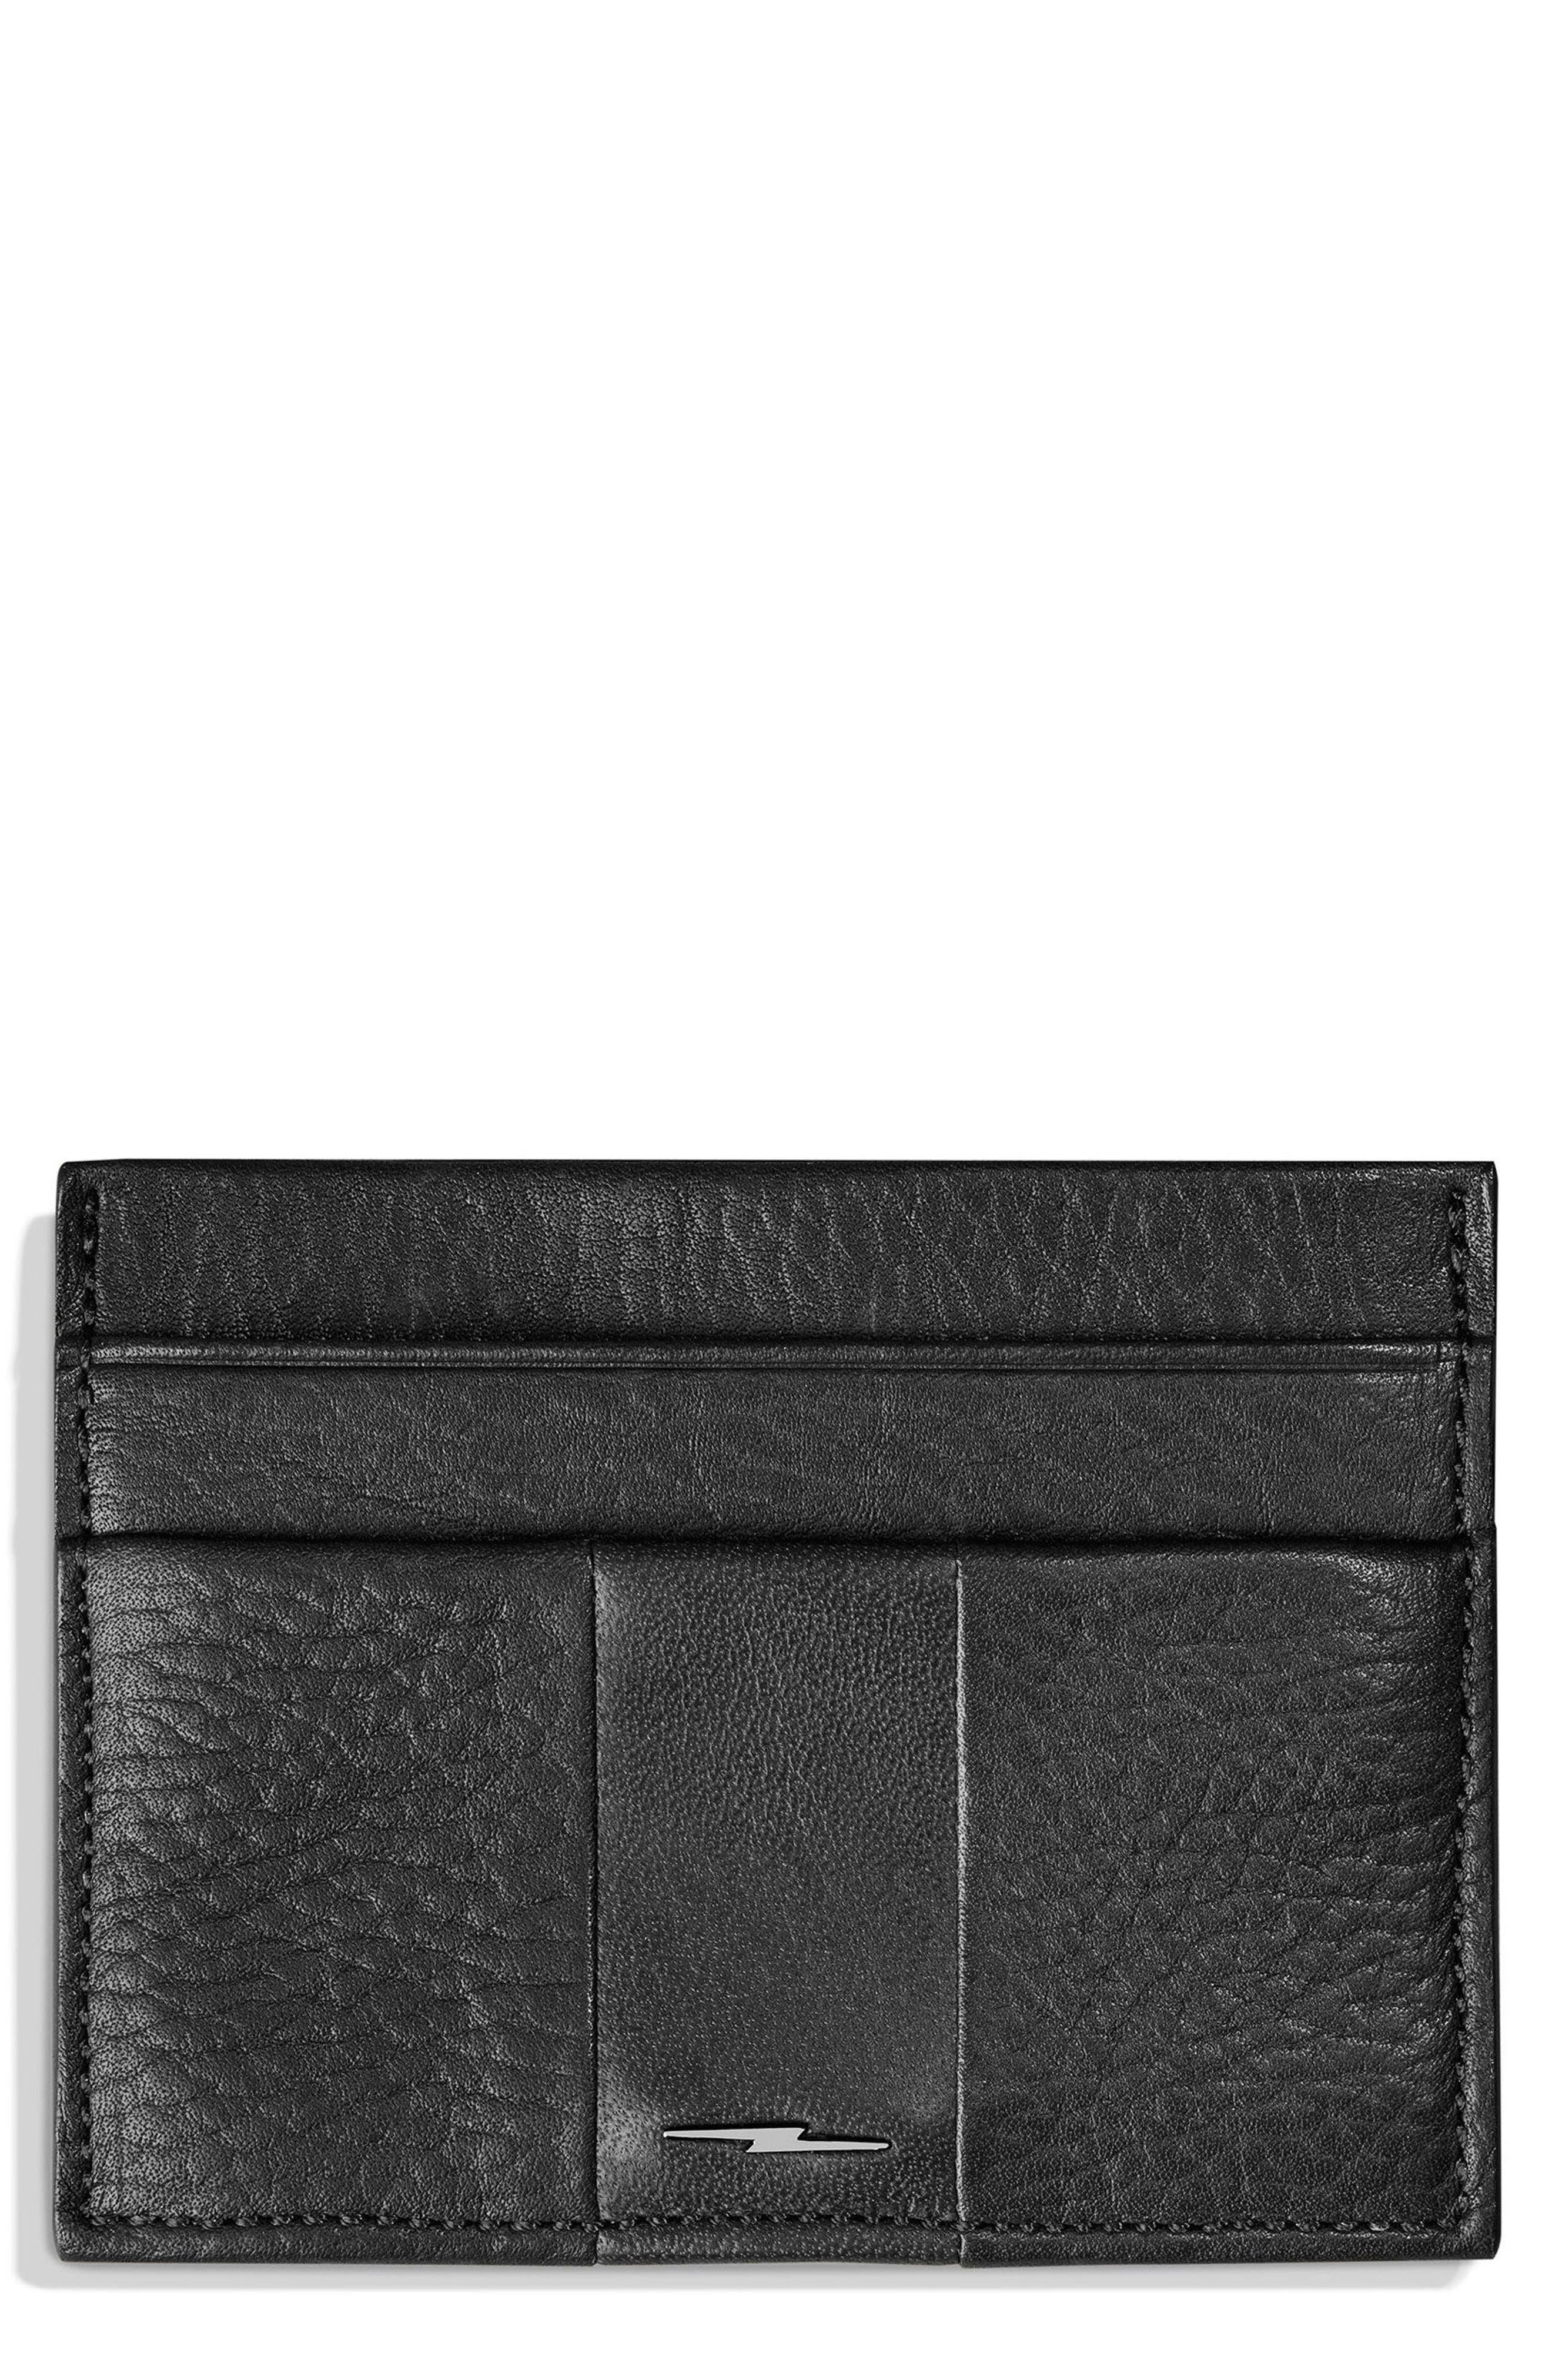 Shinola Bolt Leather Card Case